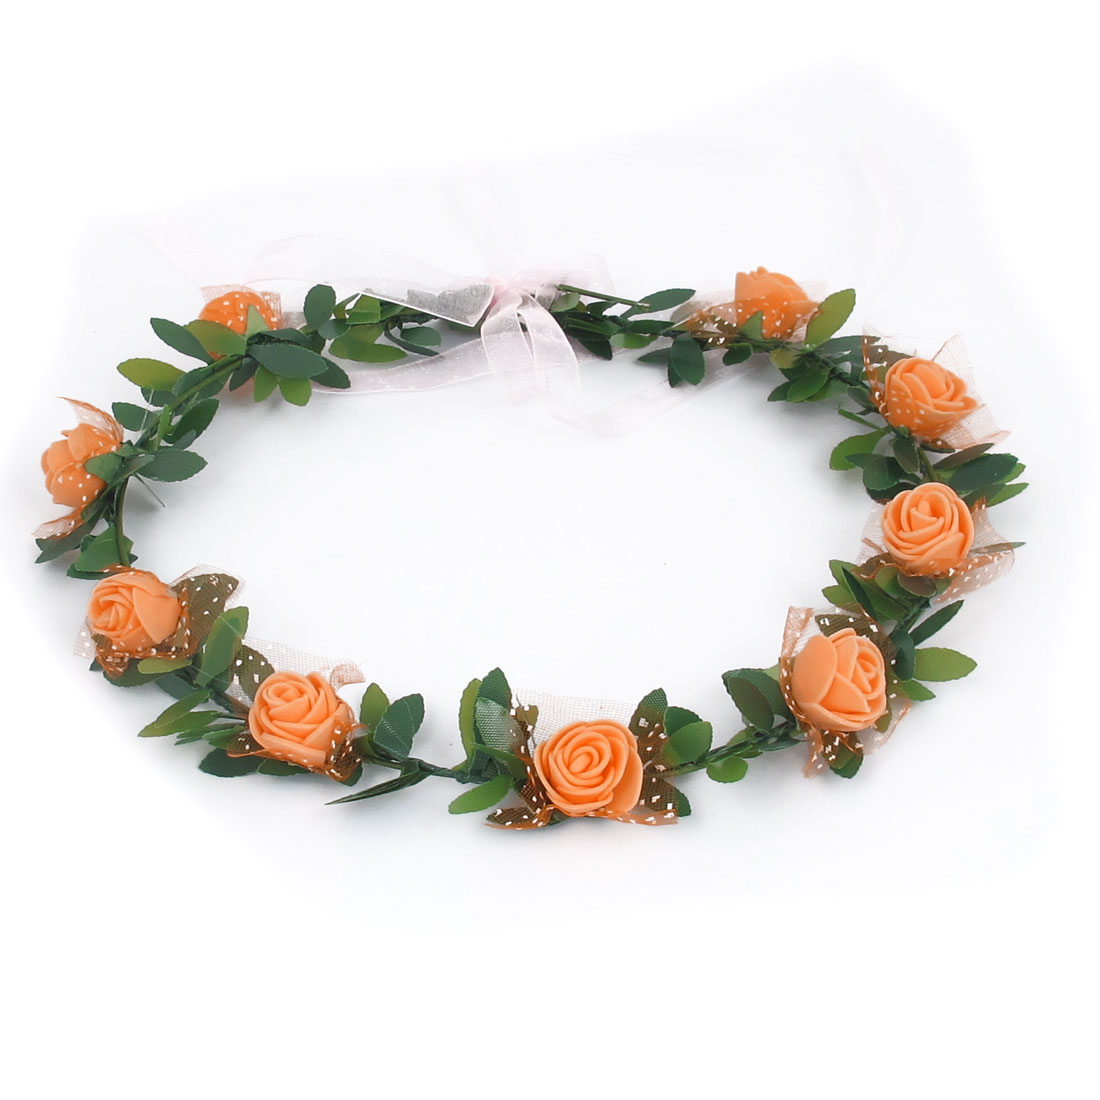 Lady Wedding Party Flower Decor Adjustable Headwear Headdress Hair Crown Wreath Orange